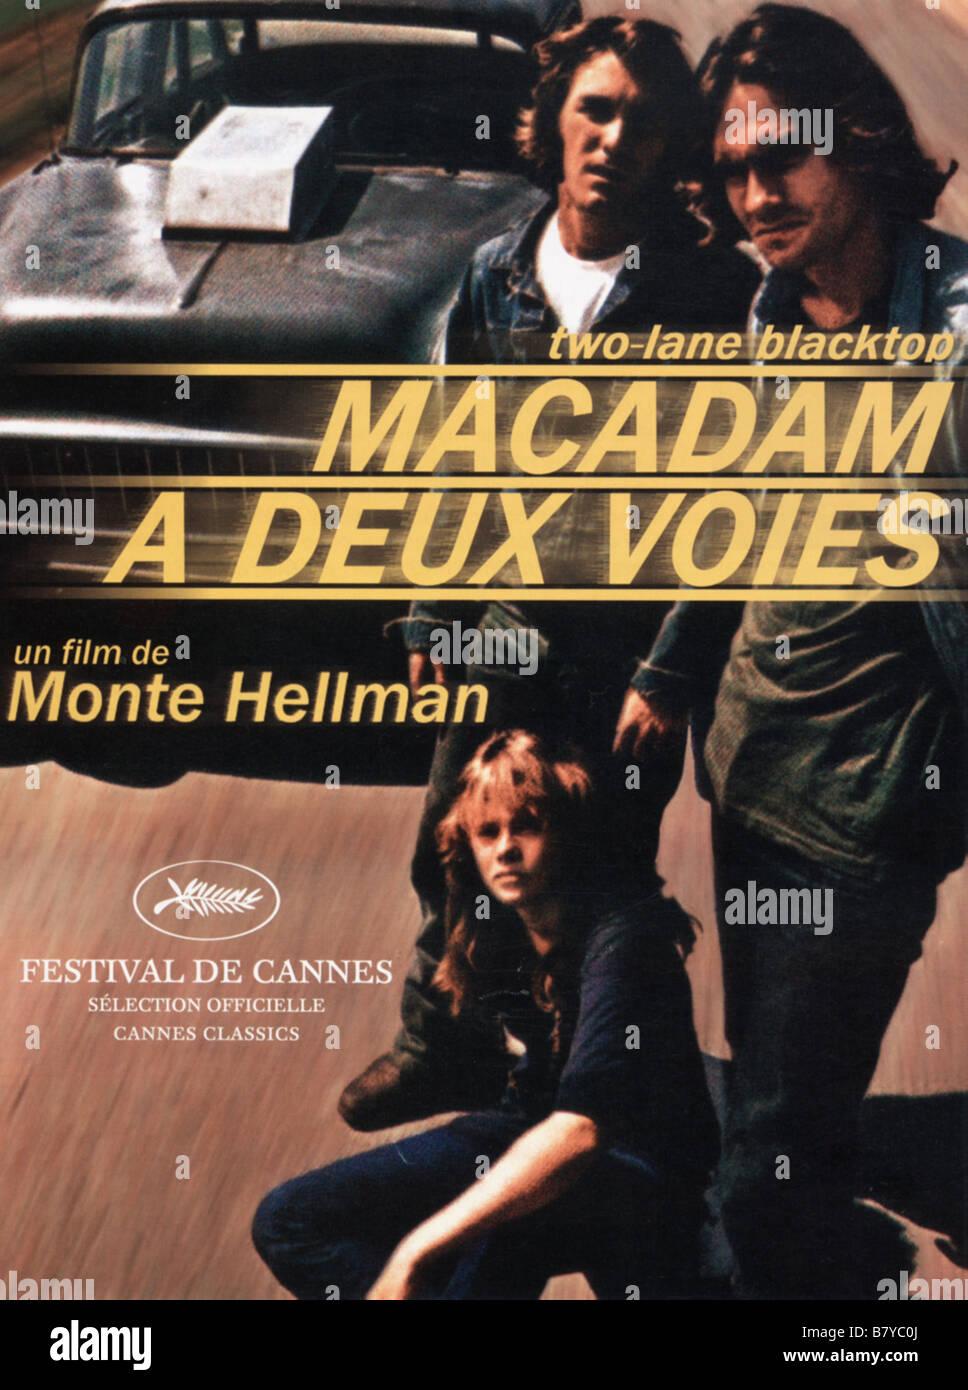 Two-Lane Blacktop  Year: 1971 USA Director: Monte Hellman Movie poster (Fr) - Stock Image